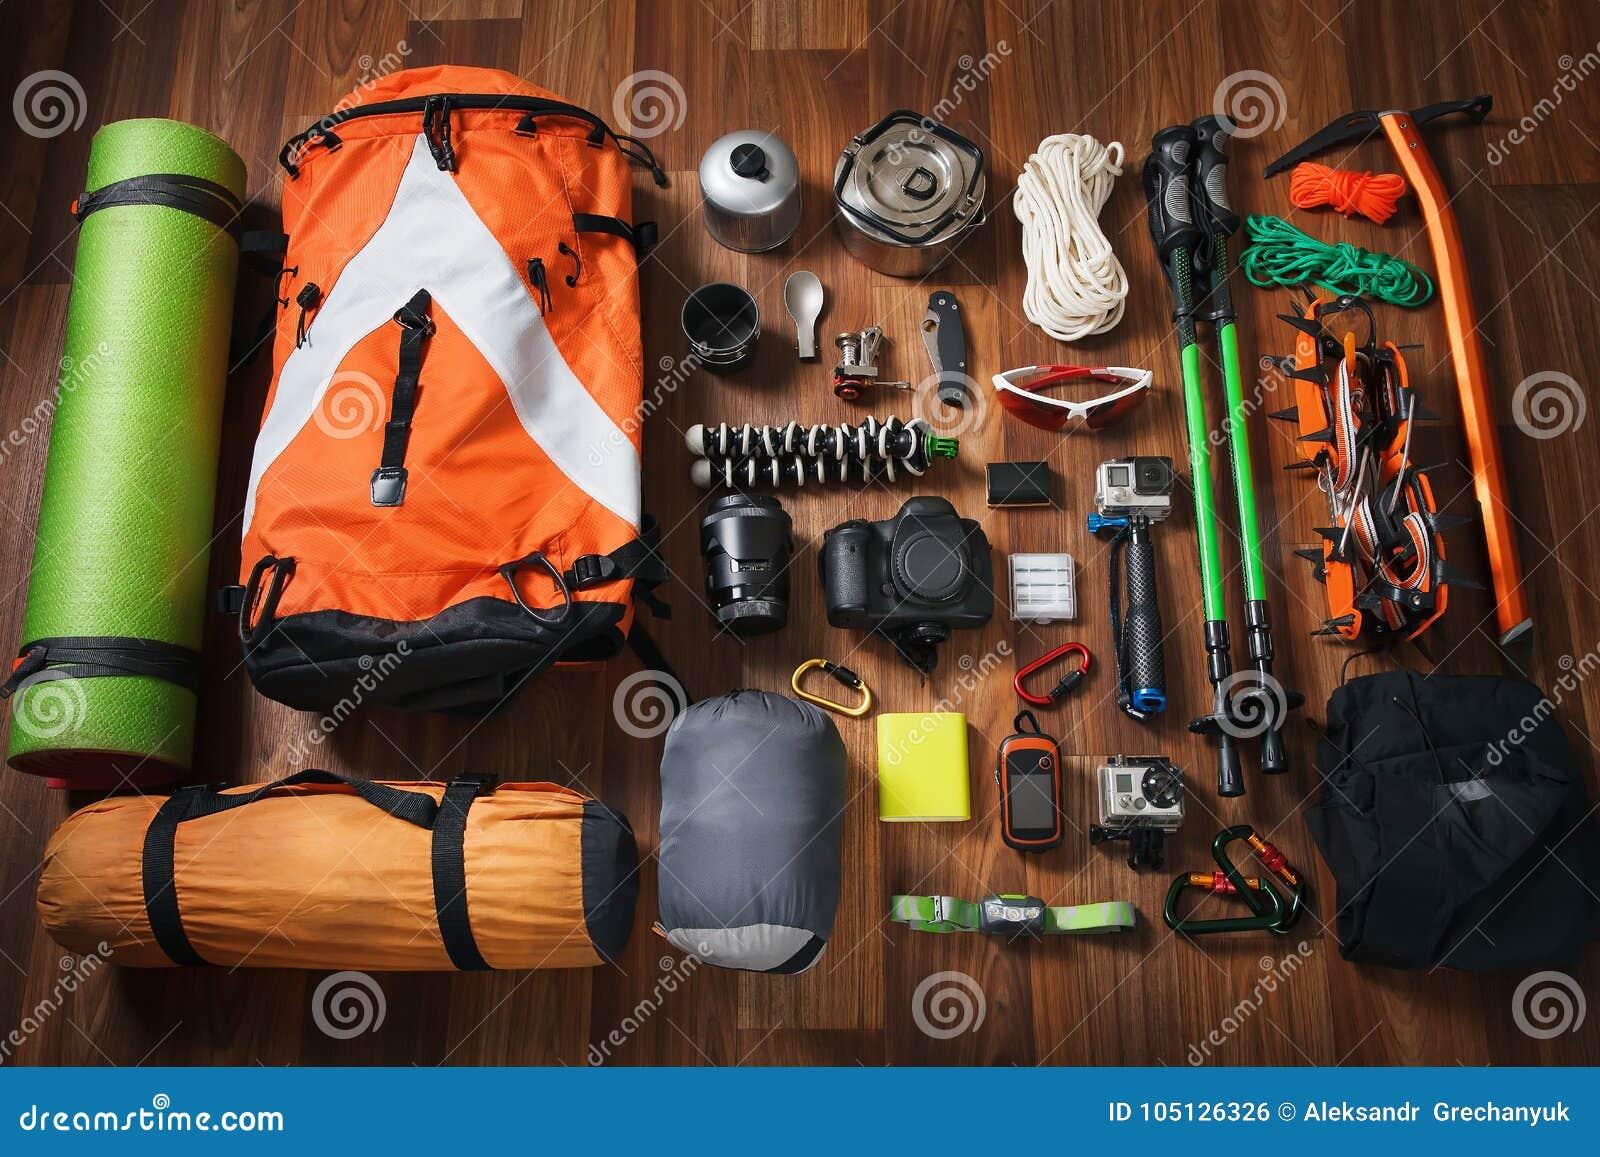 newest 22cd0 9ef15 Attrezzatura Rampicante: Rope, Scarpe Di Trekking, Ramponi ...